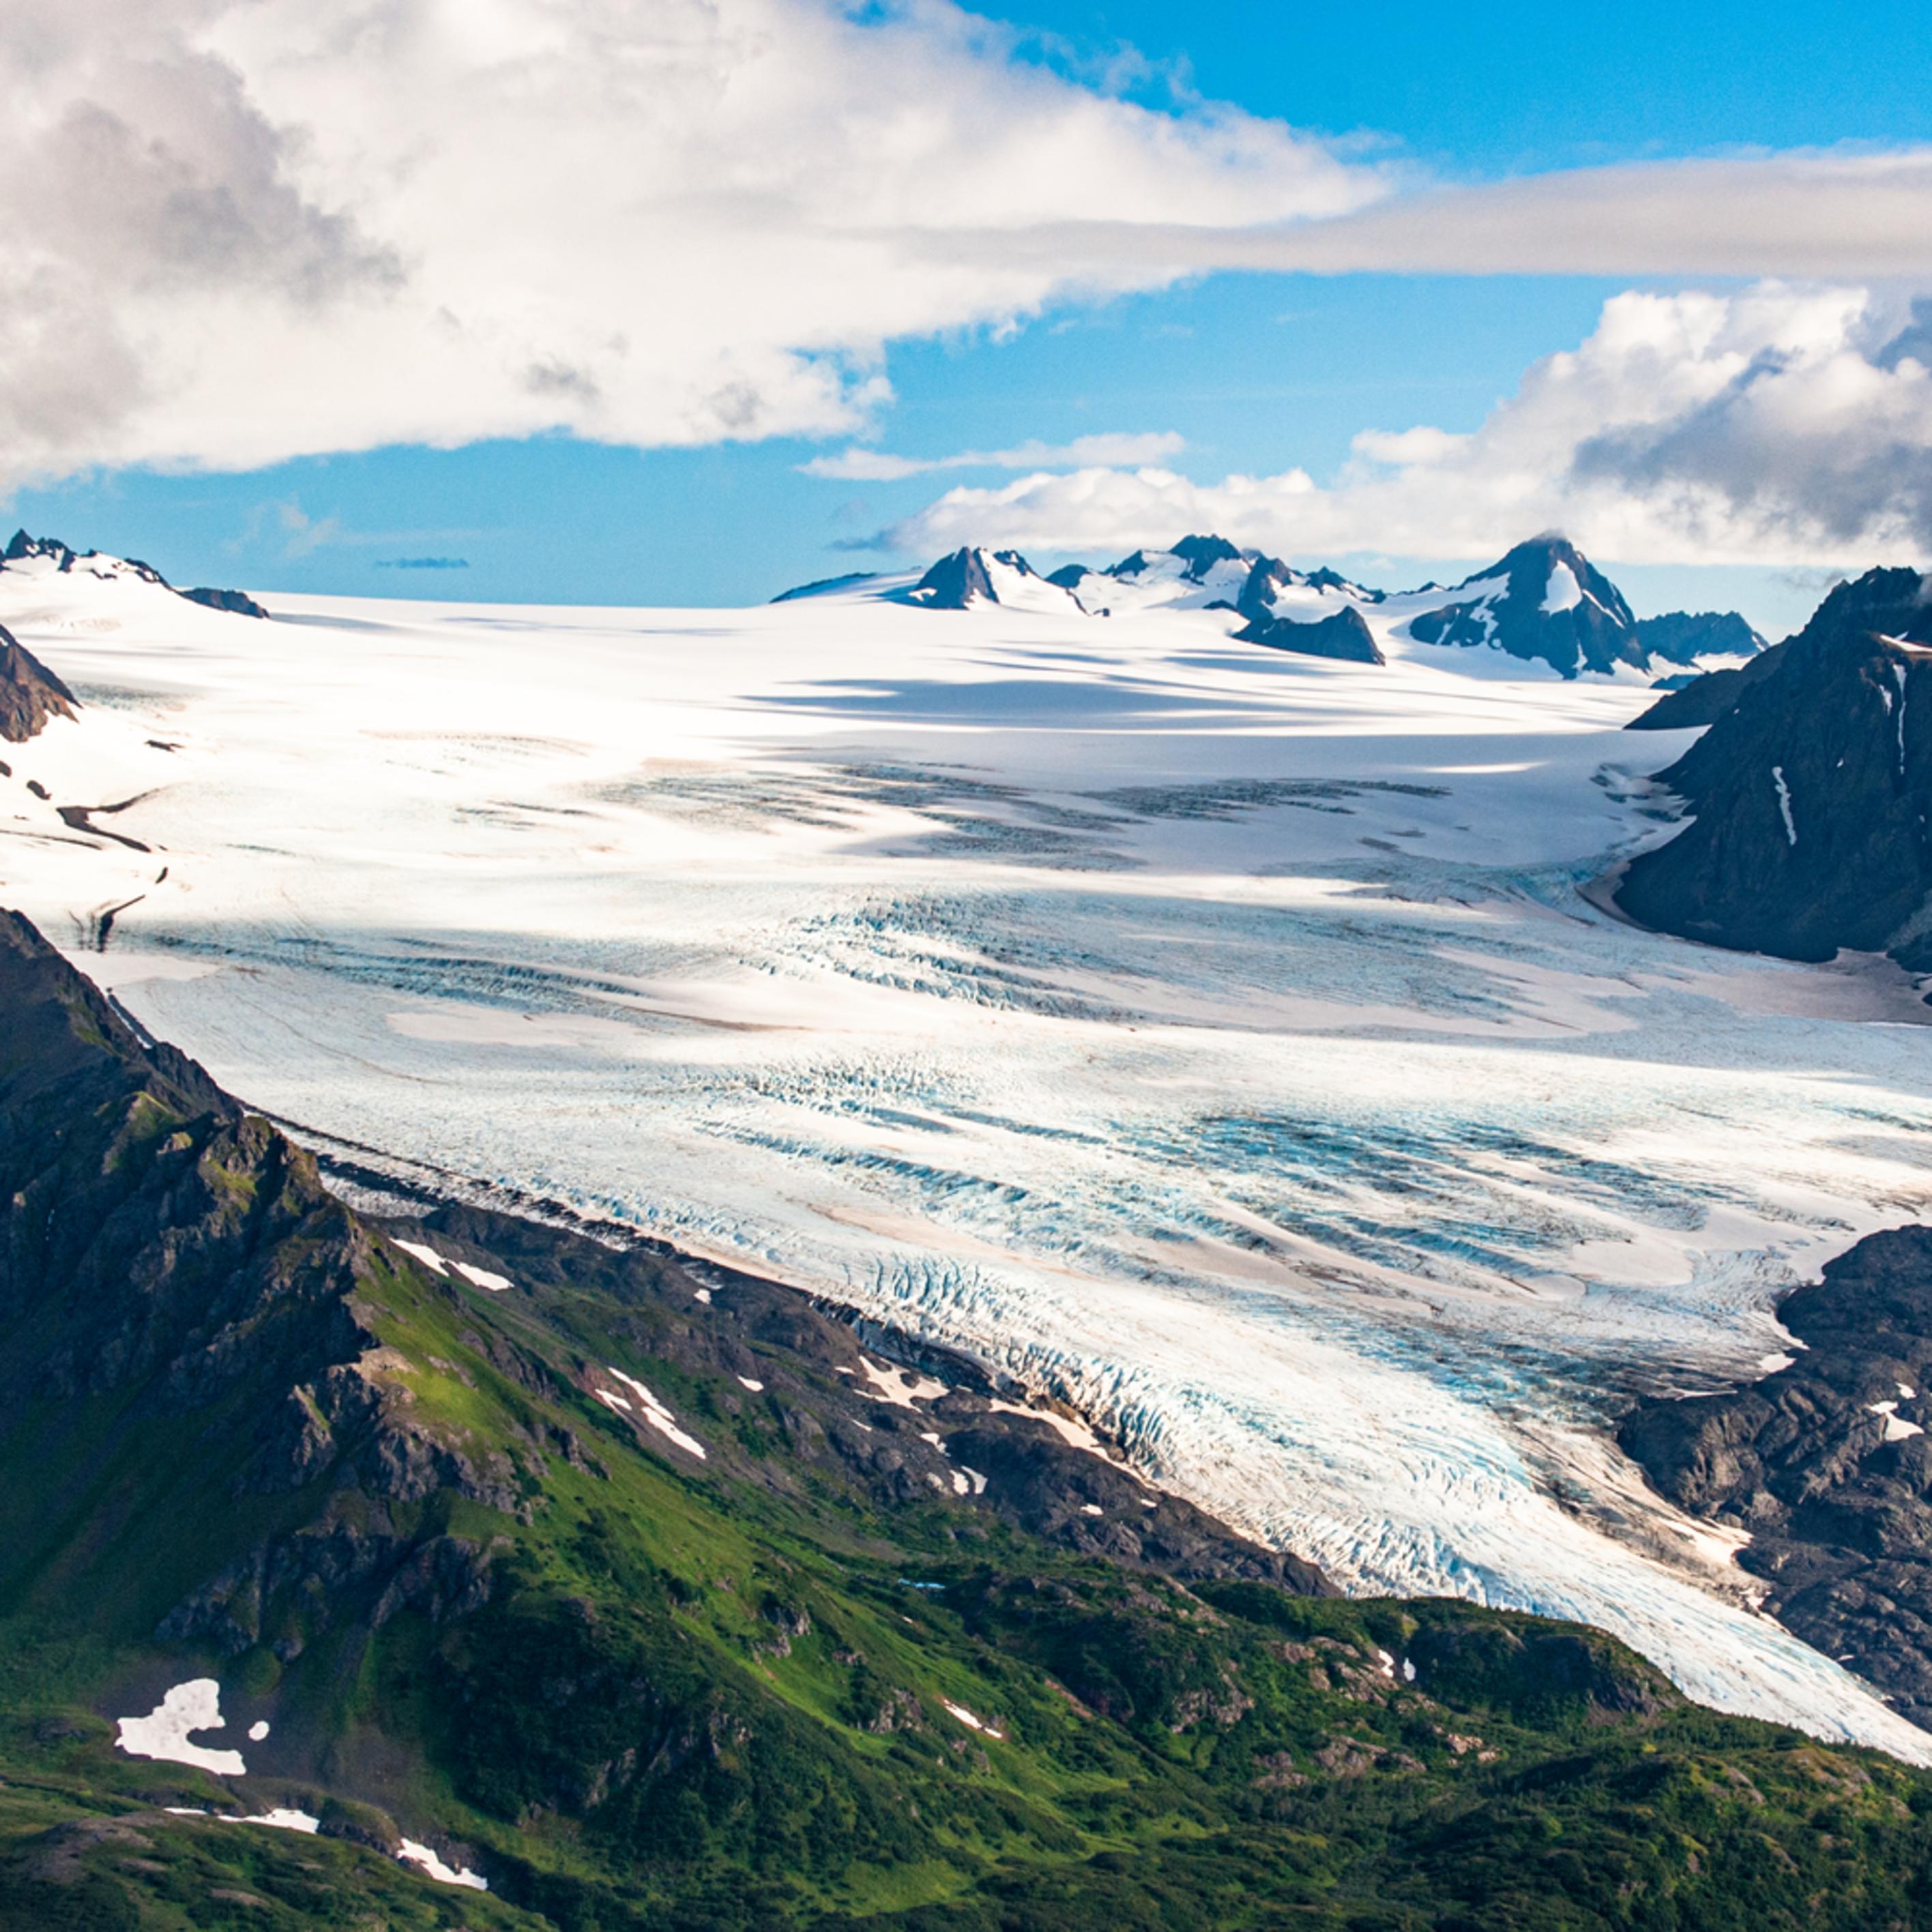 Untitleddsc 0824 caldera gerwingke glacier b5wfyc